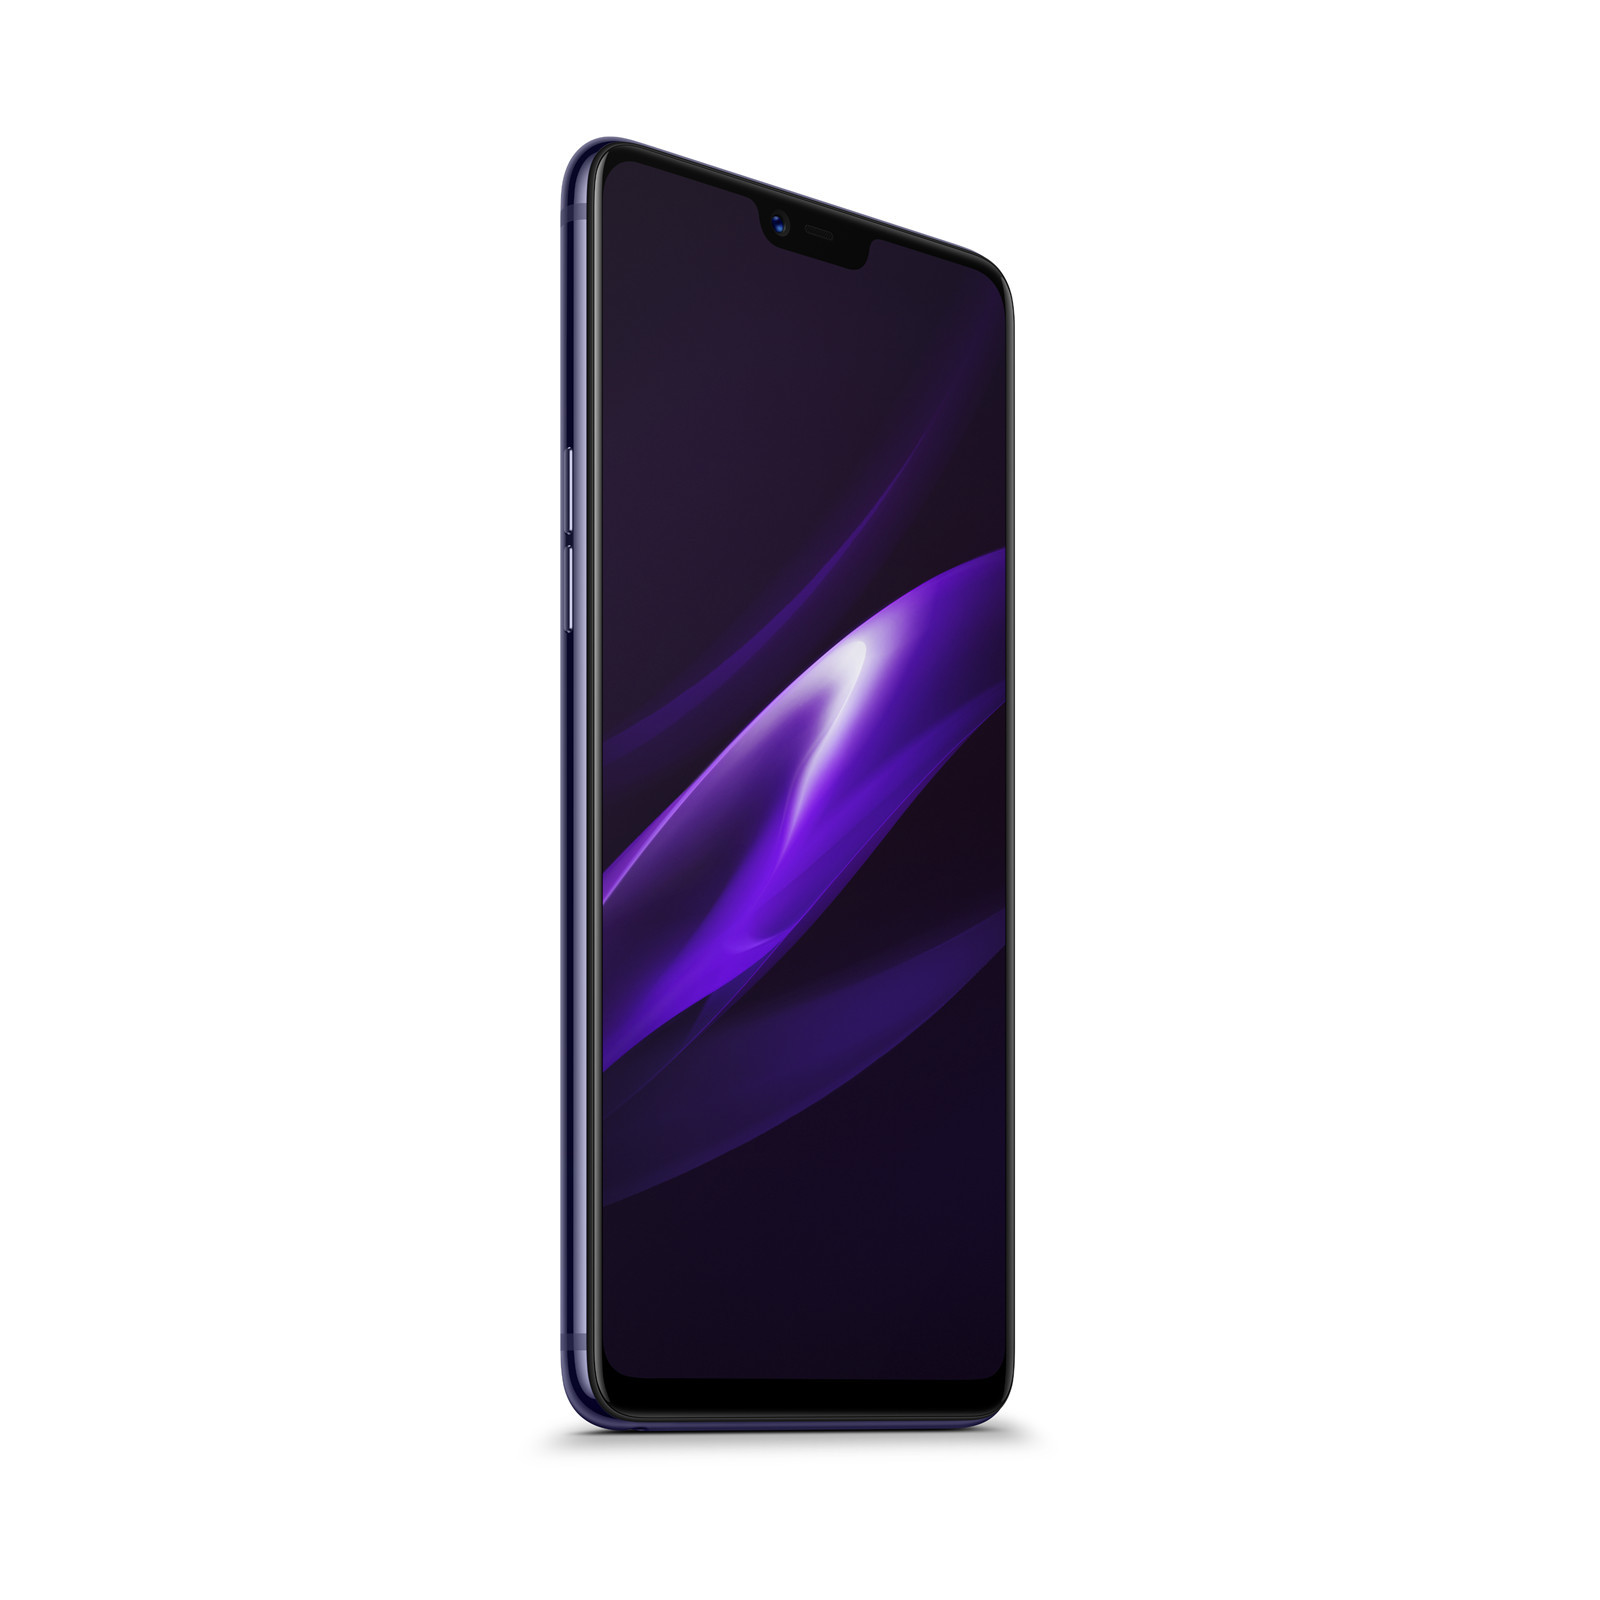 OPPO R15 Dual SIM Smartphone 128GB - Nebula Purple